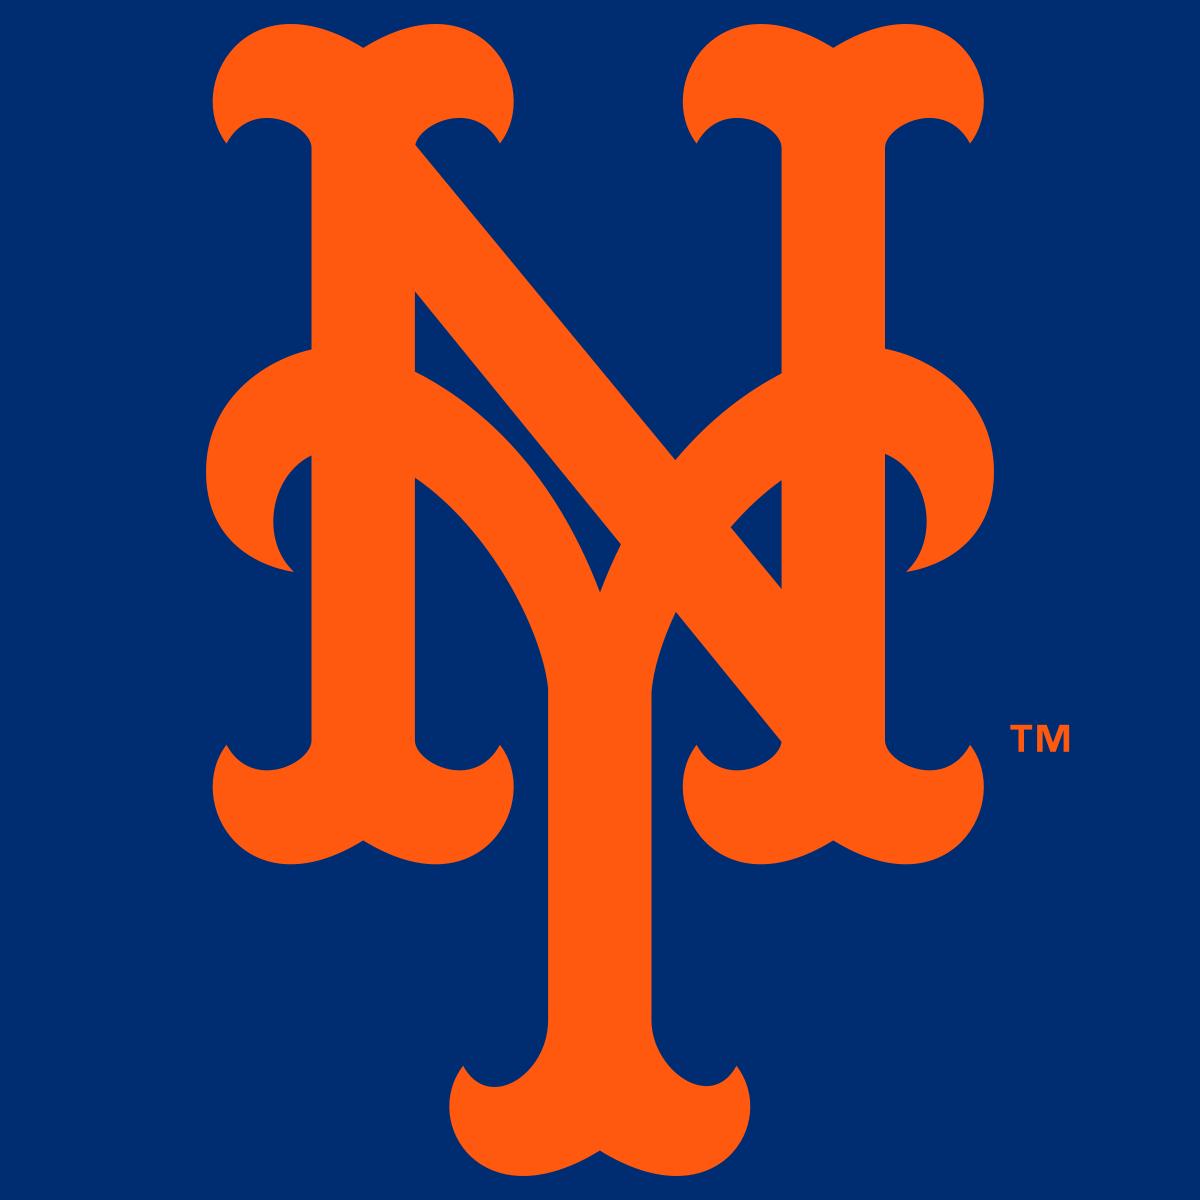 Apple Watch Face New York Mets Baseball Mlb Mets New York Mets Mets Apple Watch Custom Faces